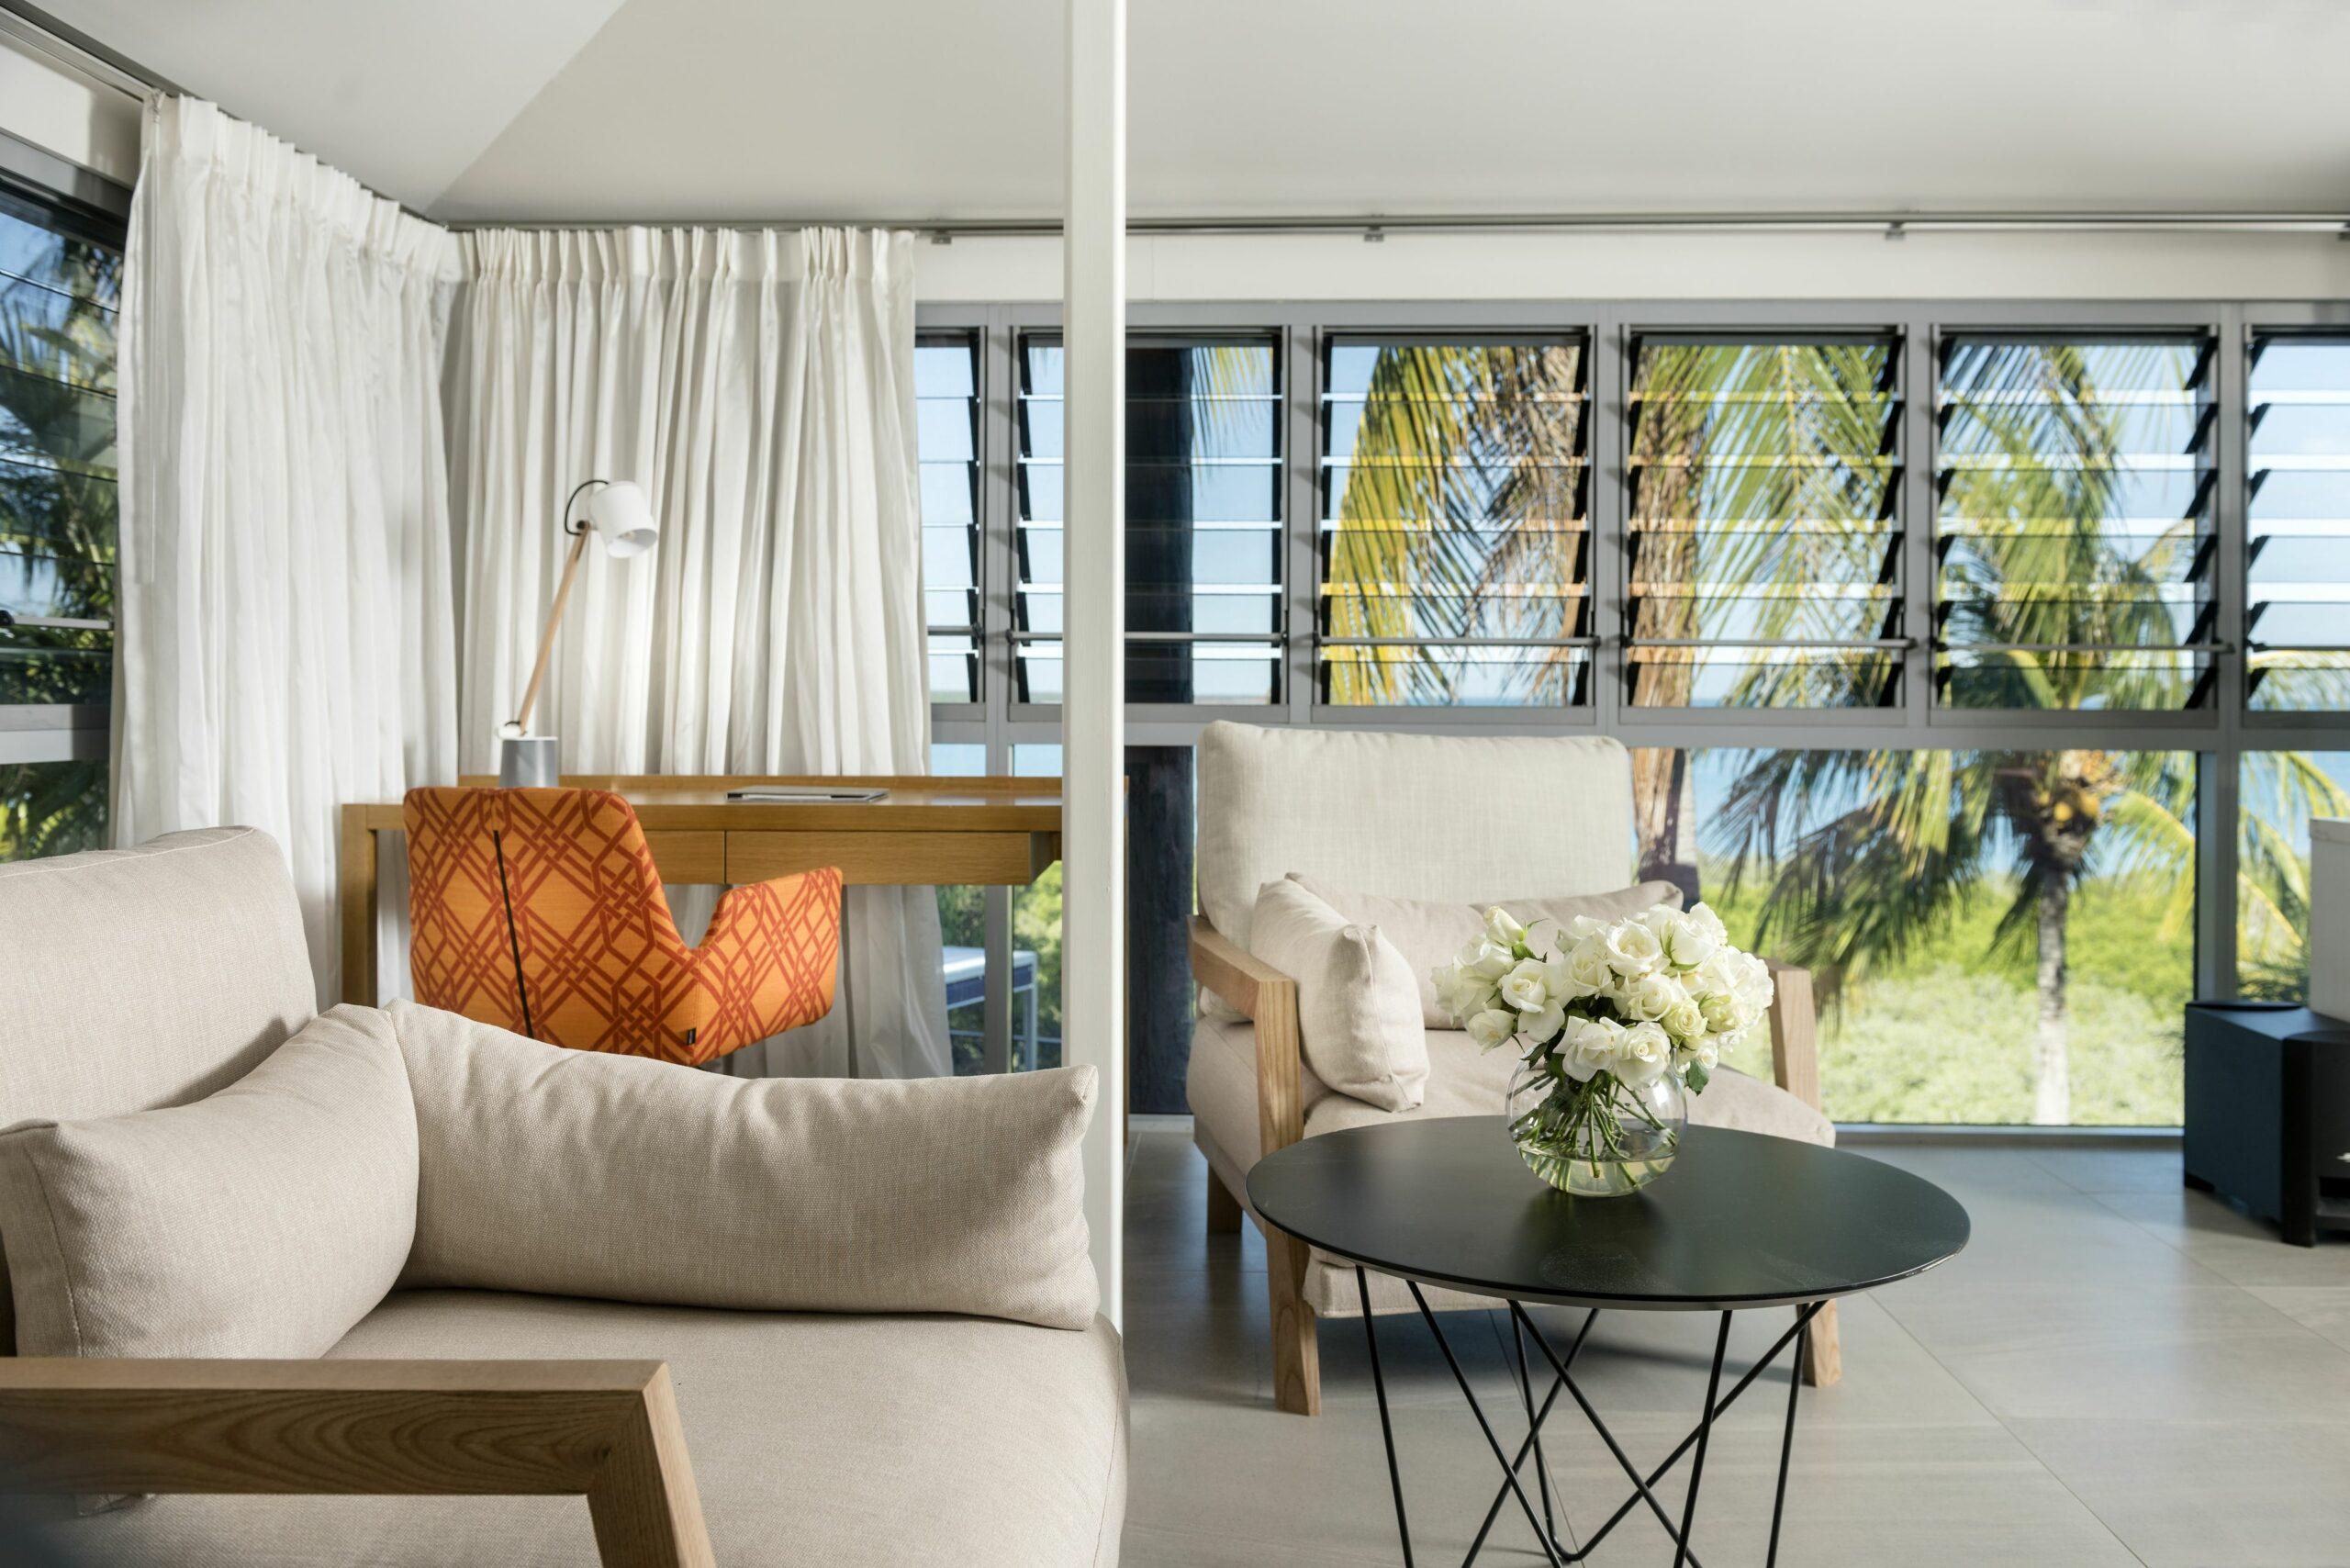 Mangrove Hotel